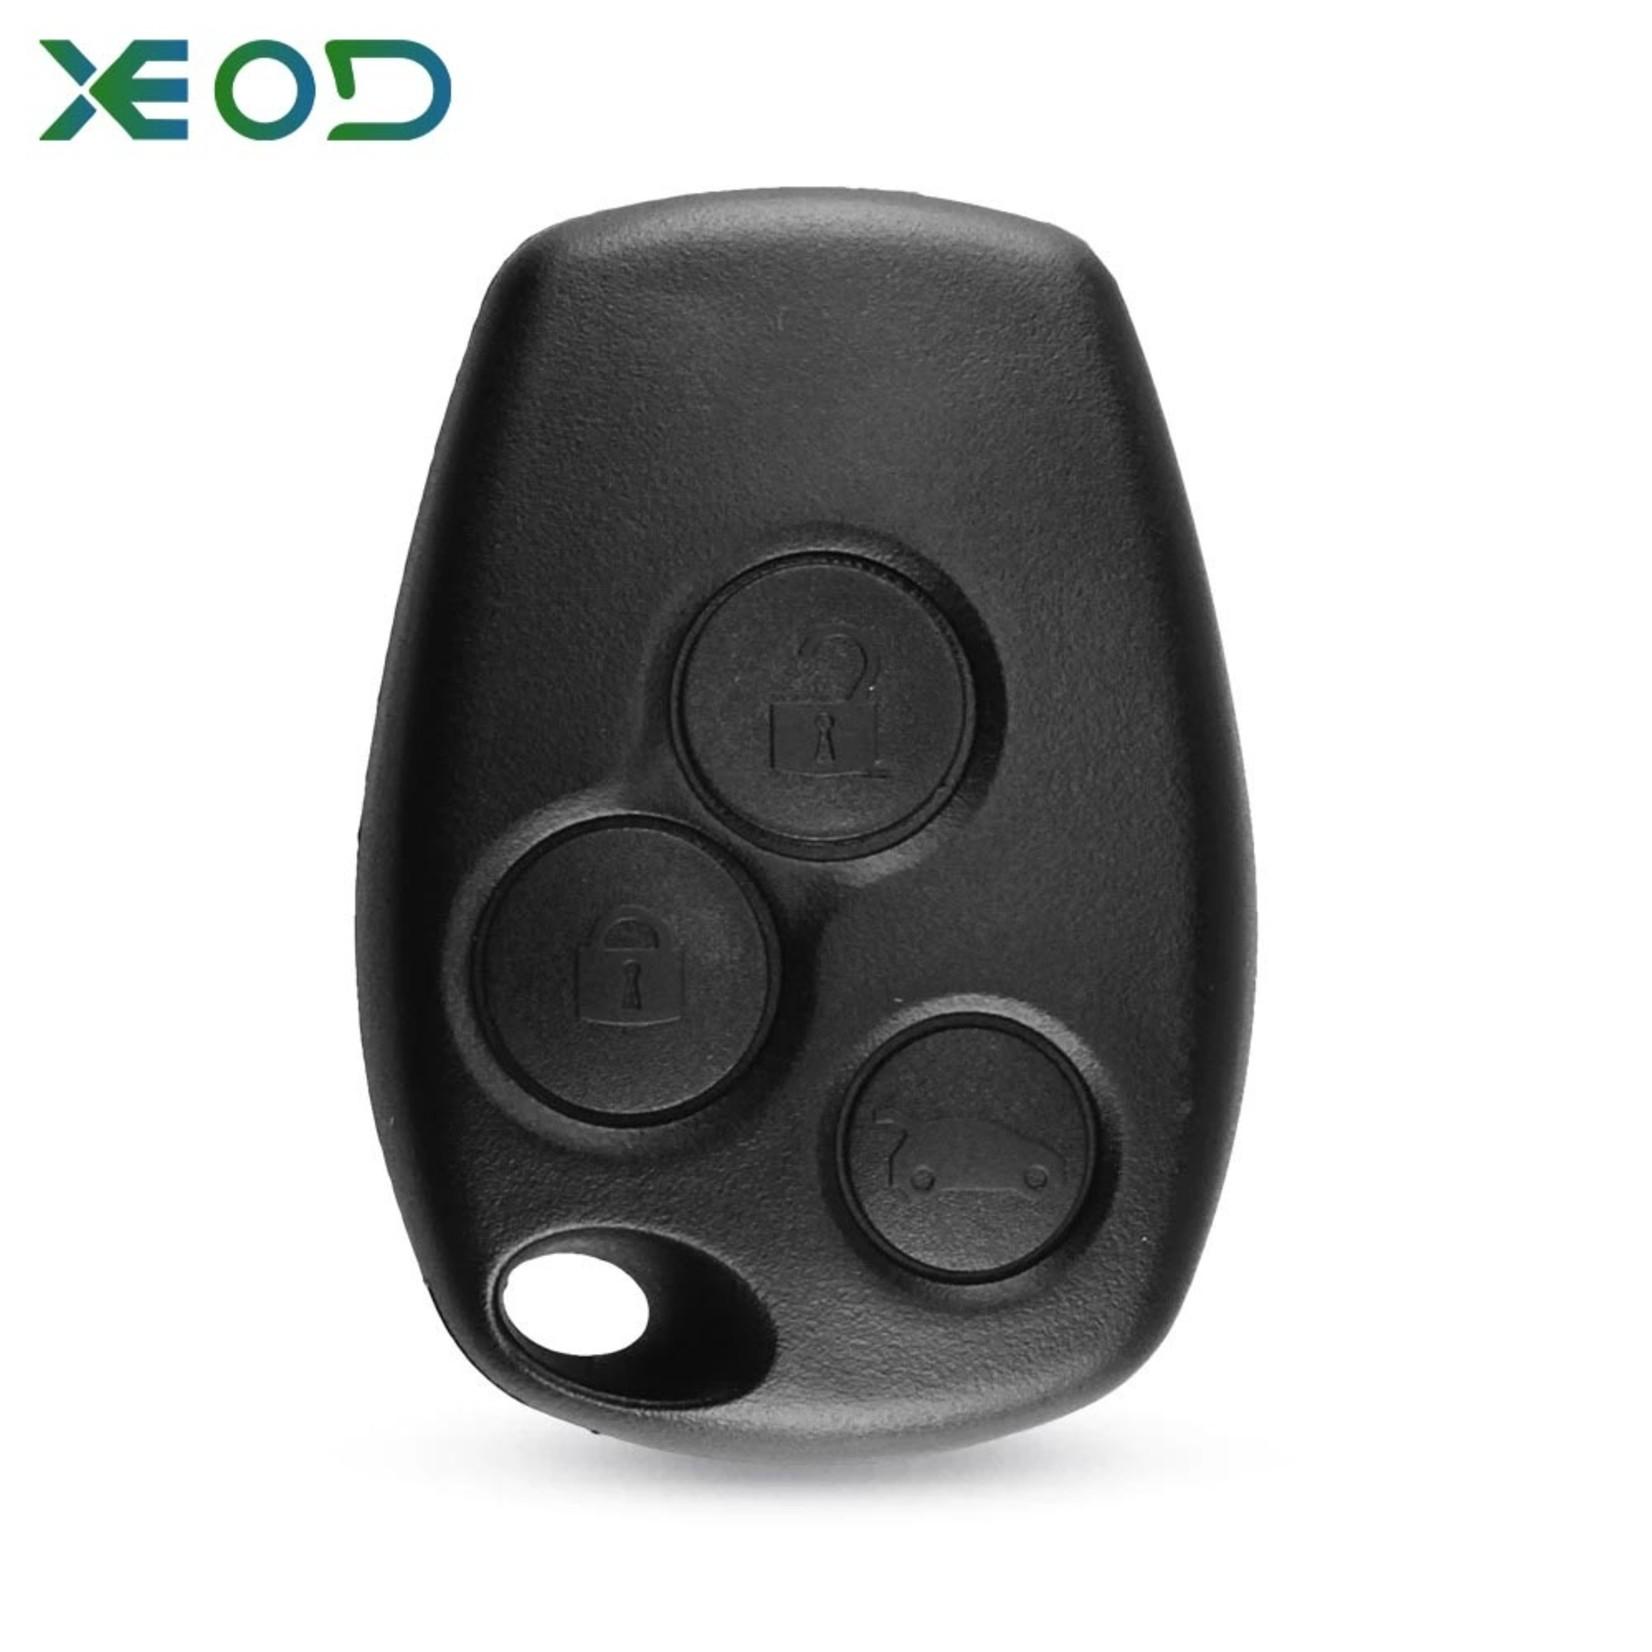 XEOD Renault 3 knops sleutelbehuizing